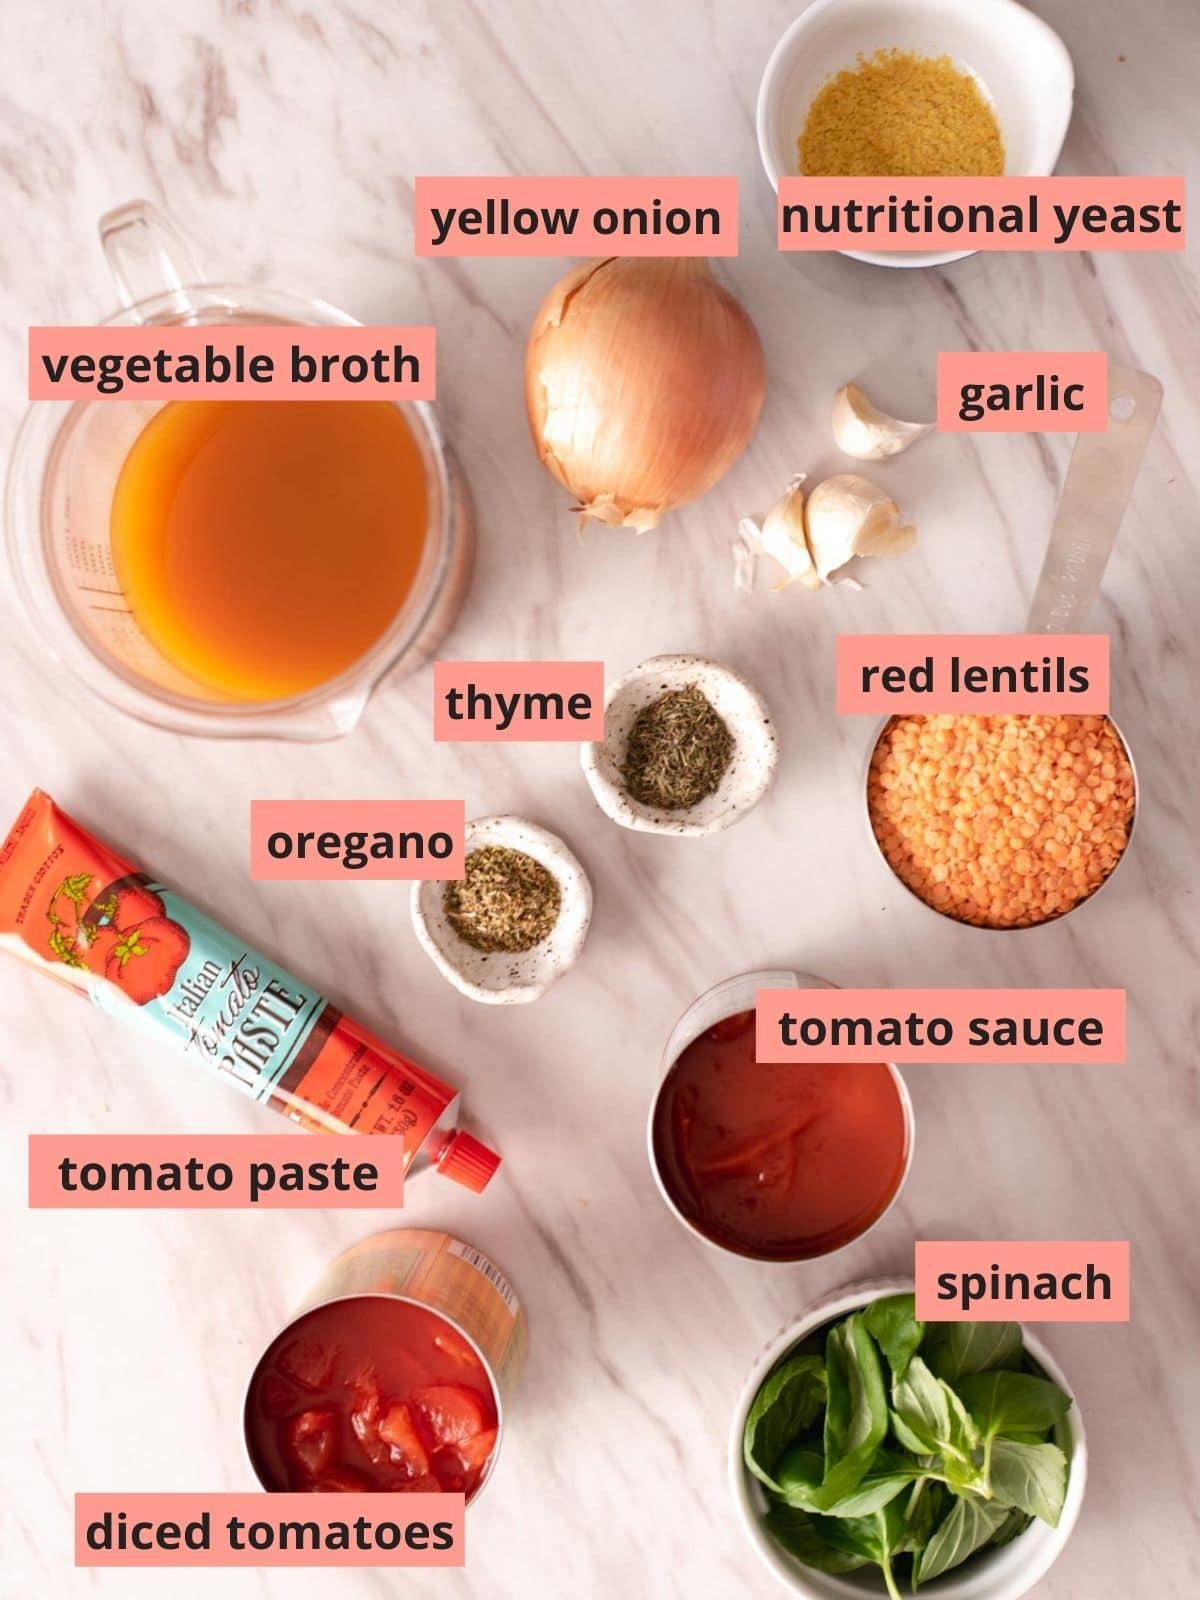 Labeled ingredients used to make lentil pasta